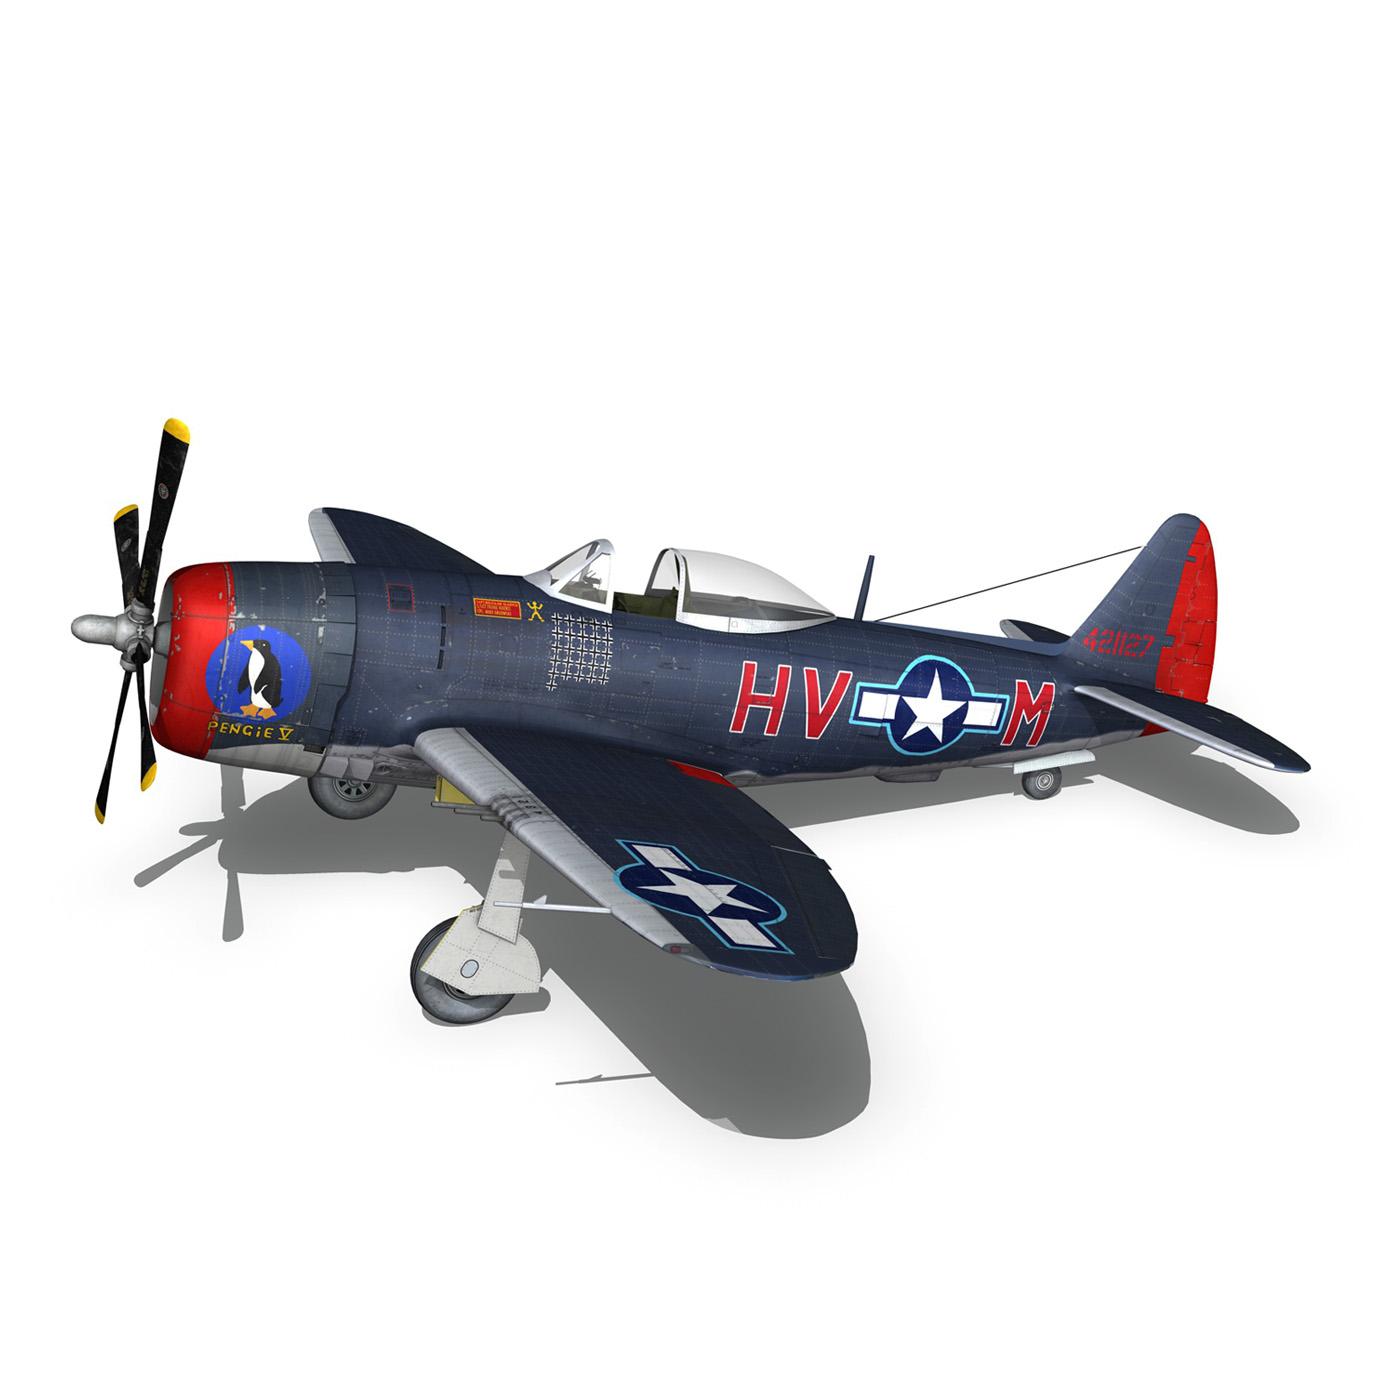 republic p-47m thunderbolt – pengie v 3d model 3ds c4d fbx lwo lw lws obj 279725